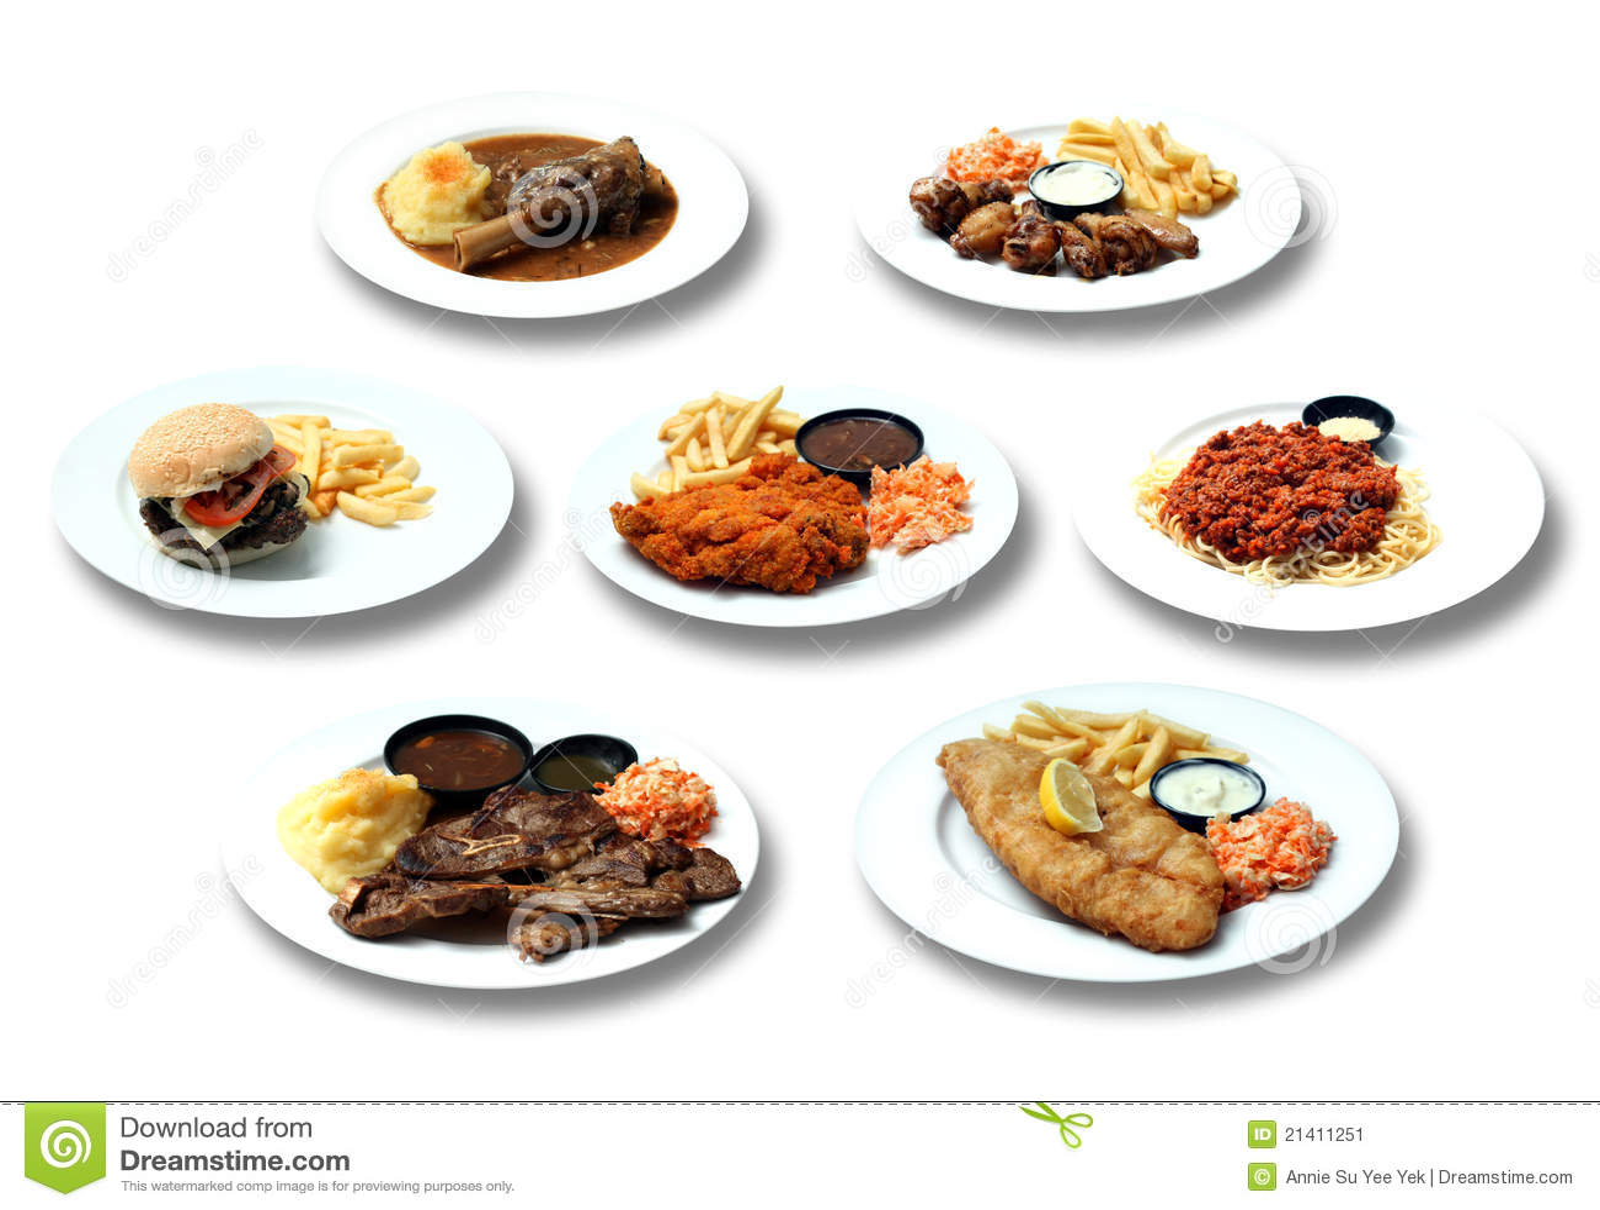 Western Food Stock Image - Image: 21411251